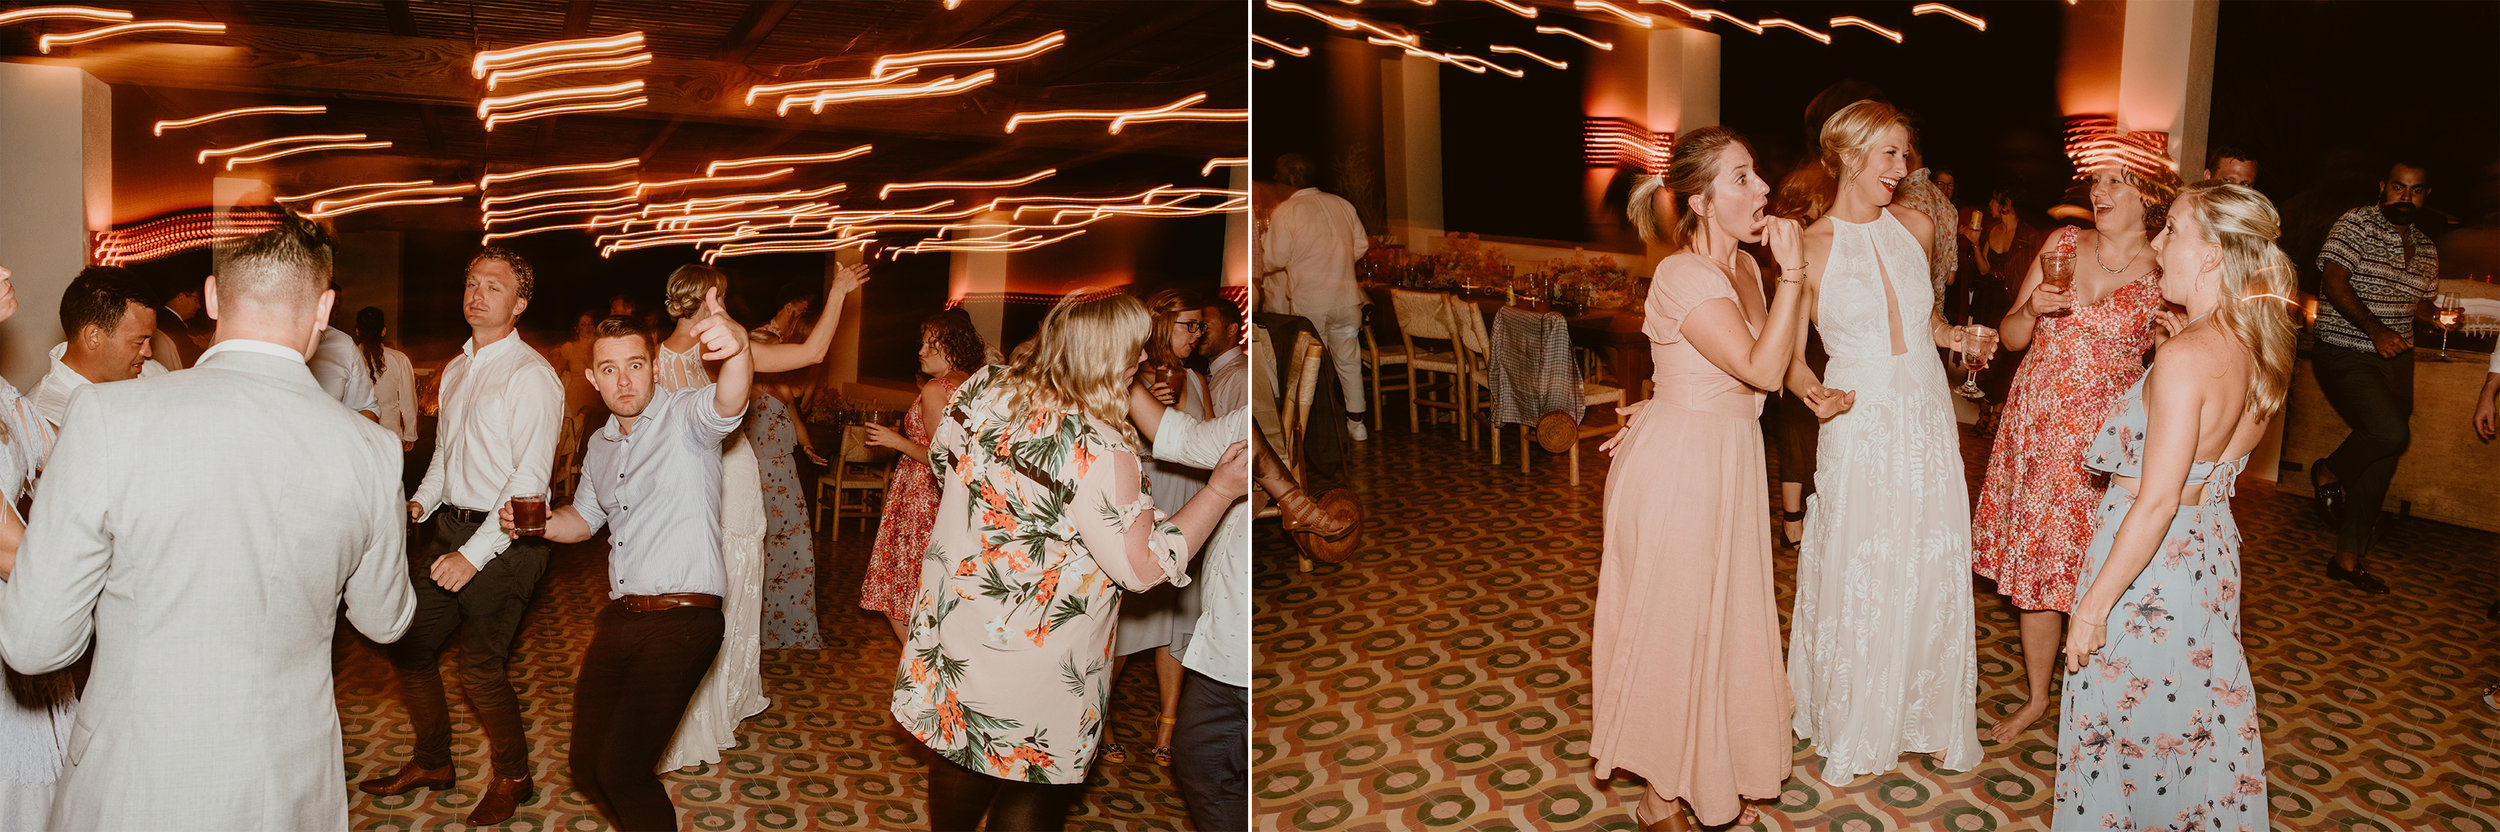 Lisa+Sam Hotel San Cristobal Wedding -558.jpg